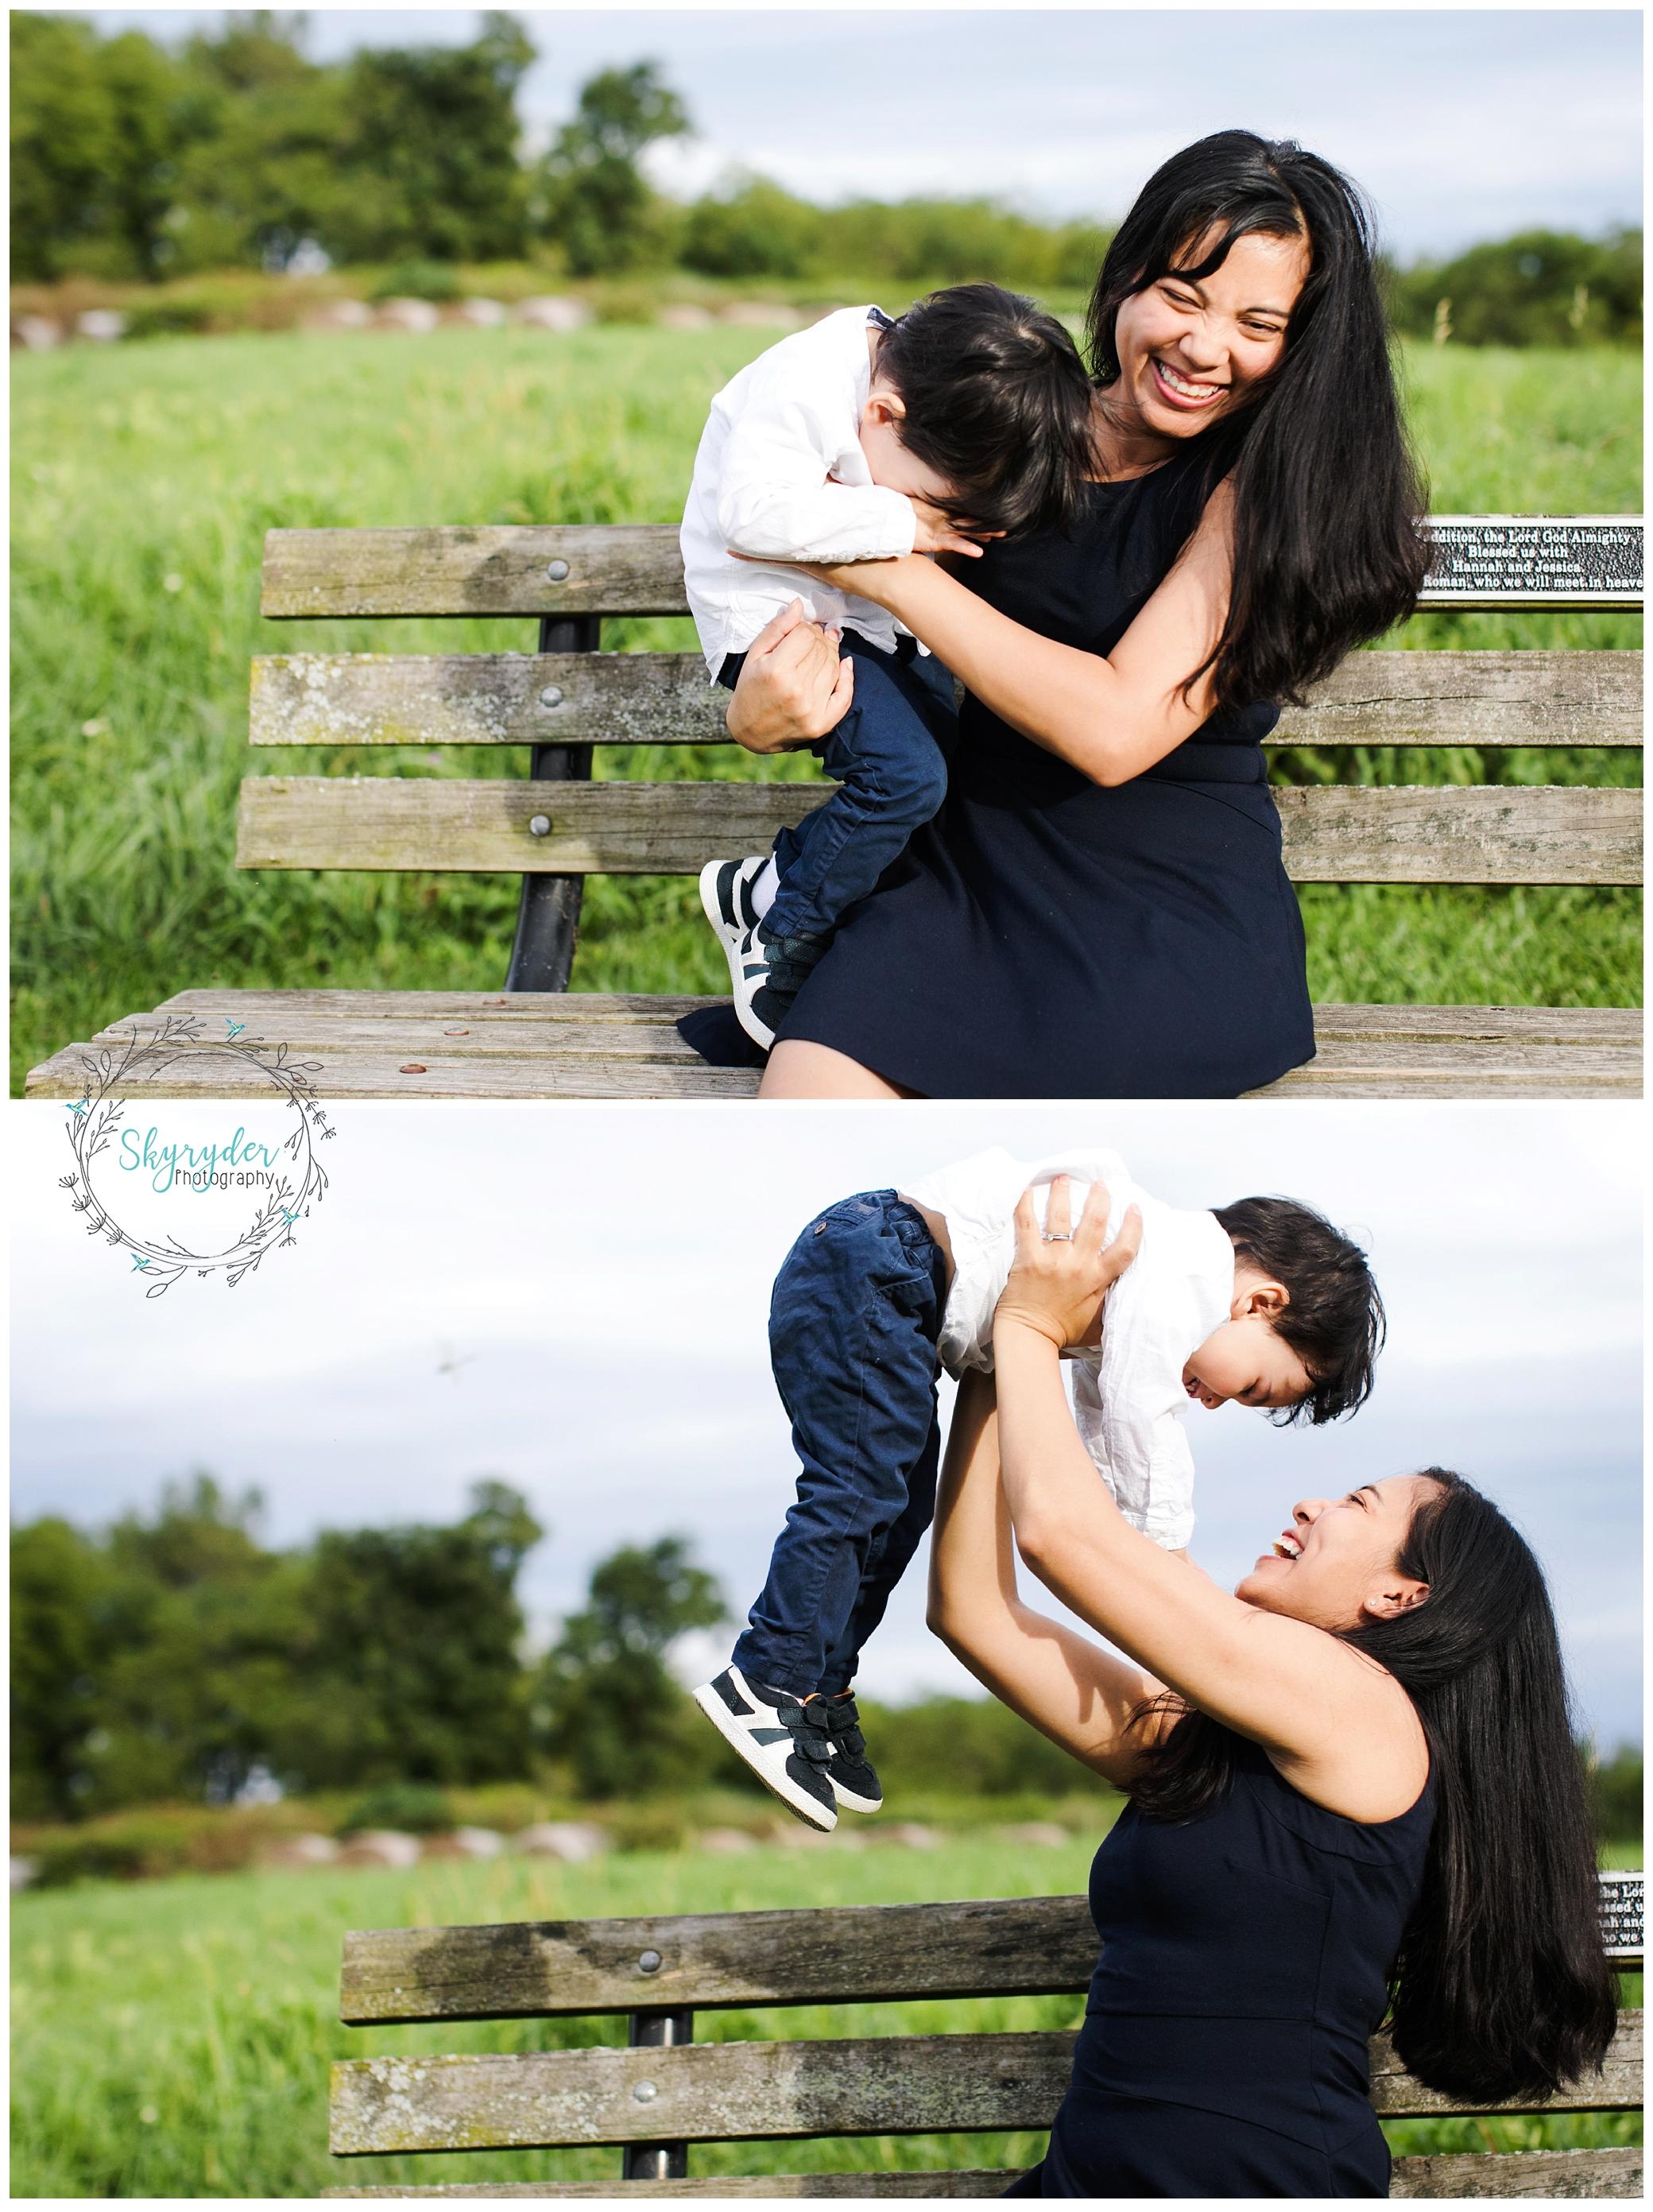 The England Family | Blacksburg Family Photographer